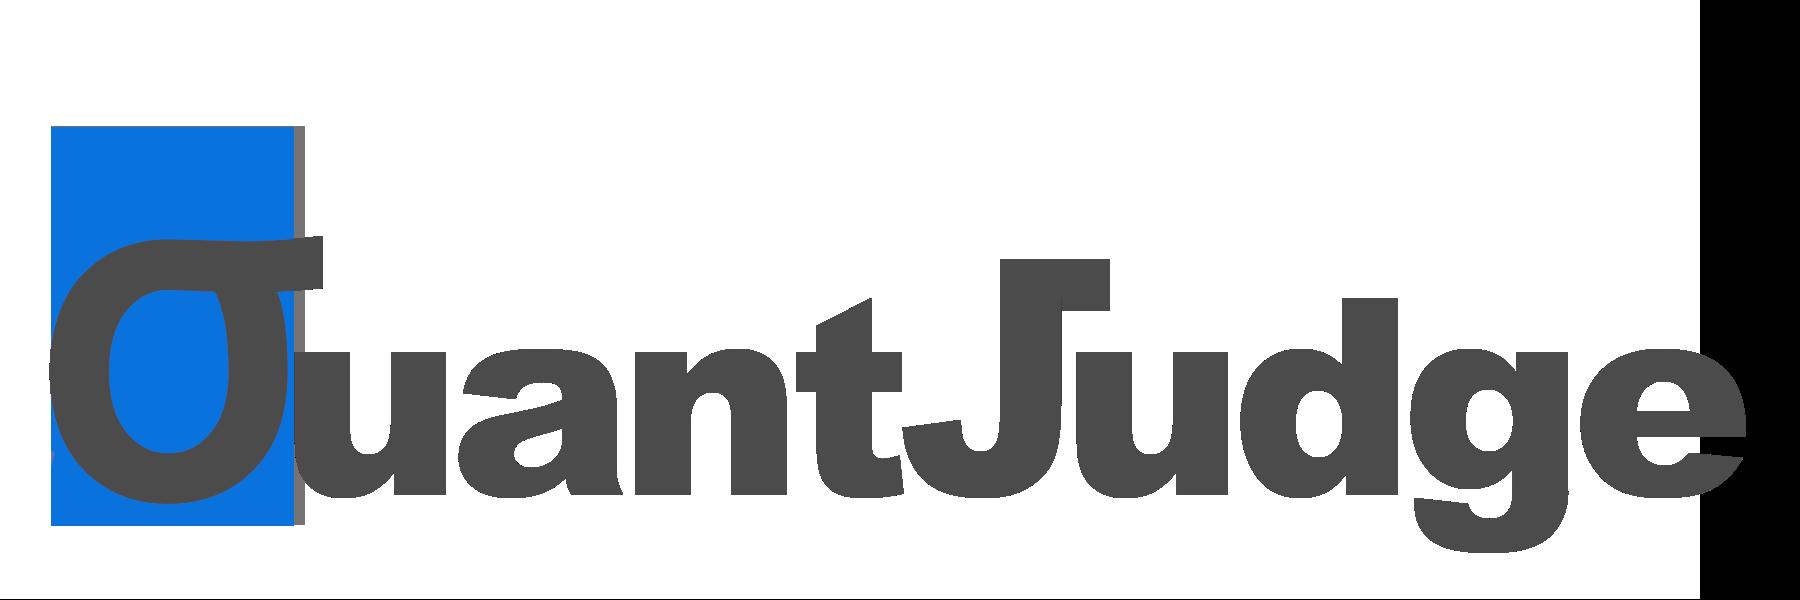 quantjudge.com